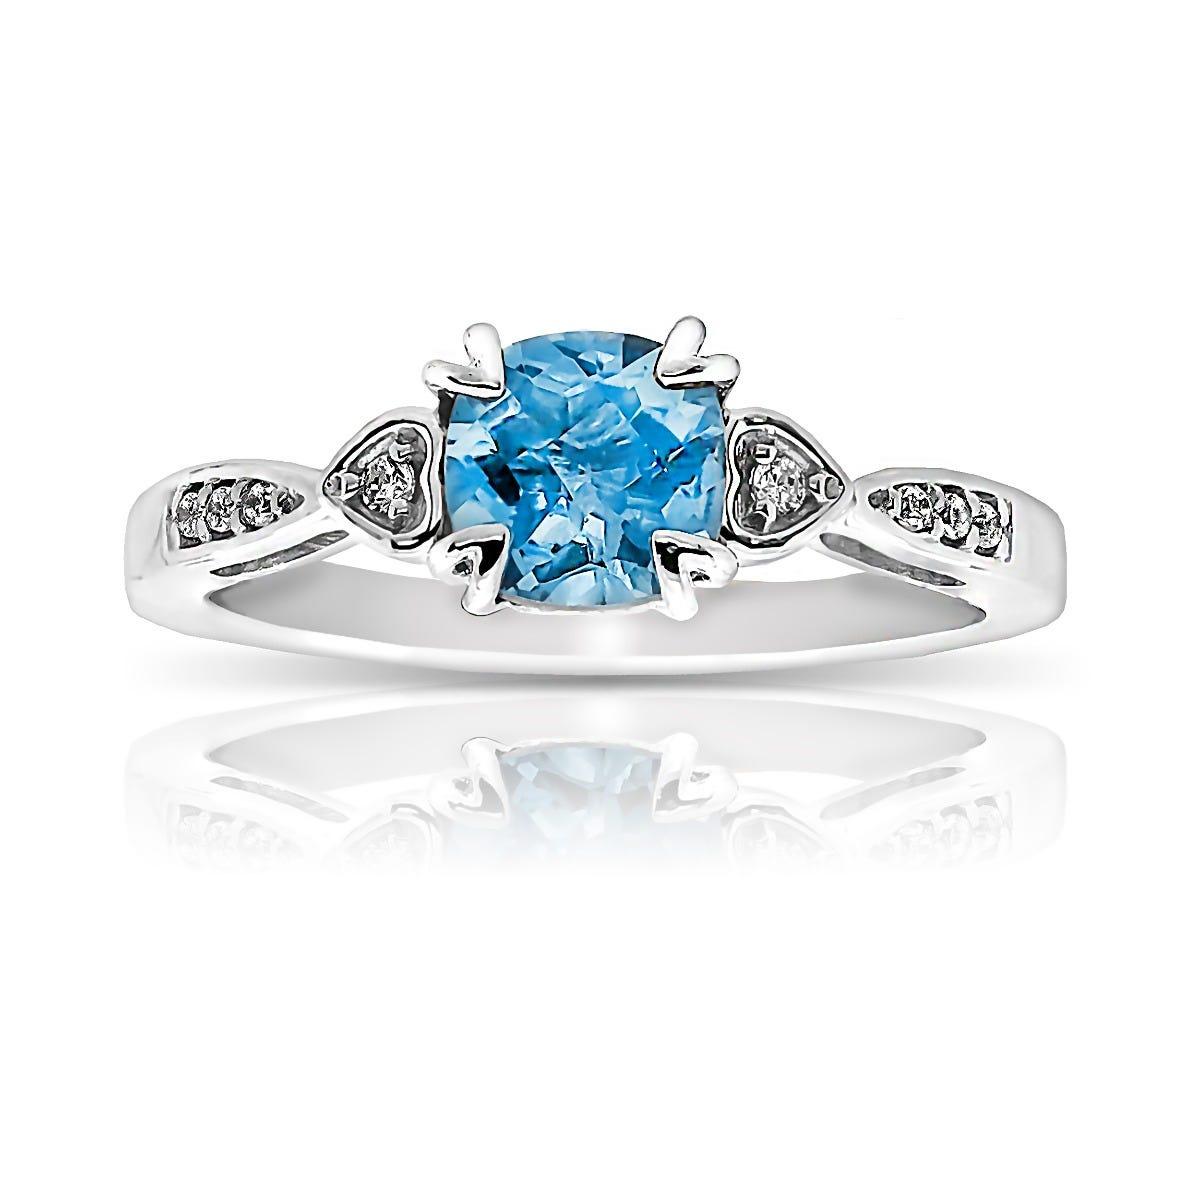 Cushion Blue Topaz & Diamond Ring in 10k White Gold